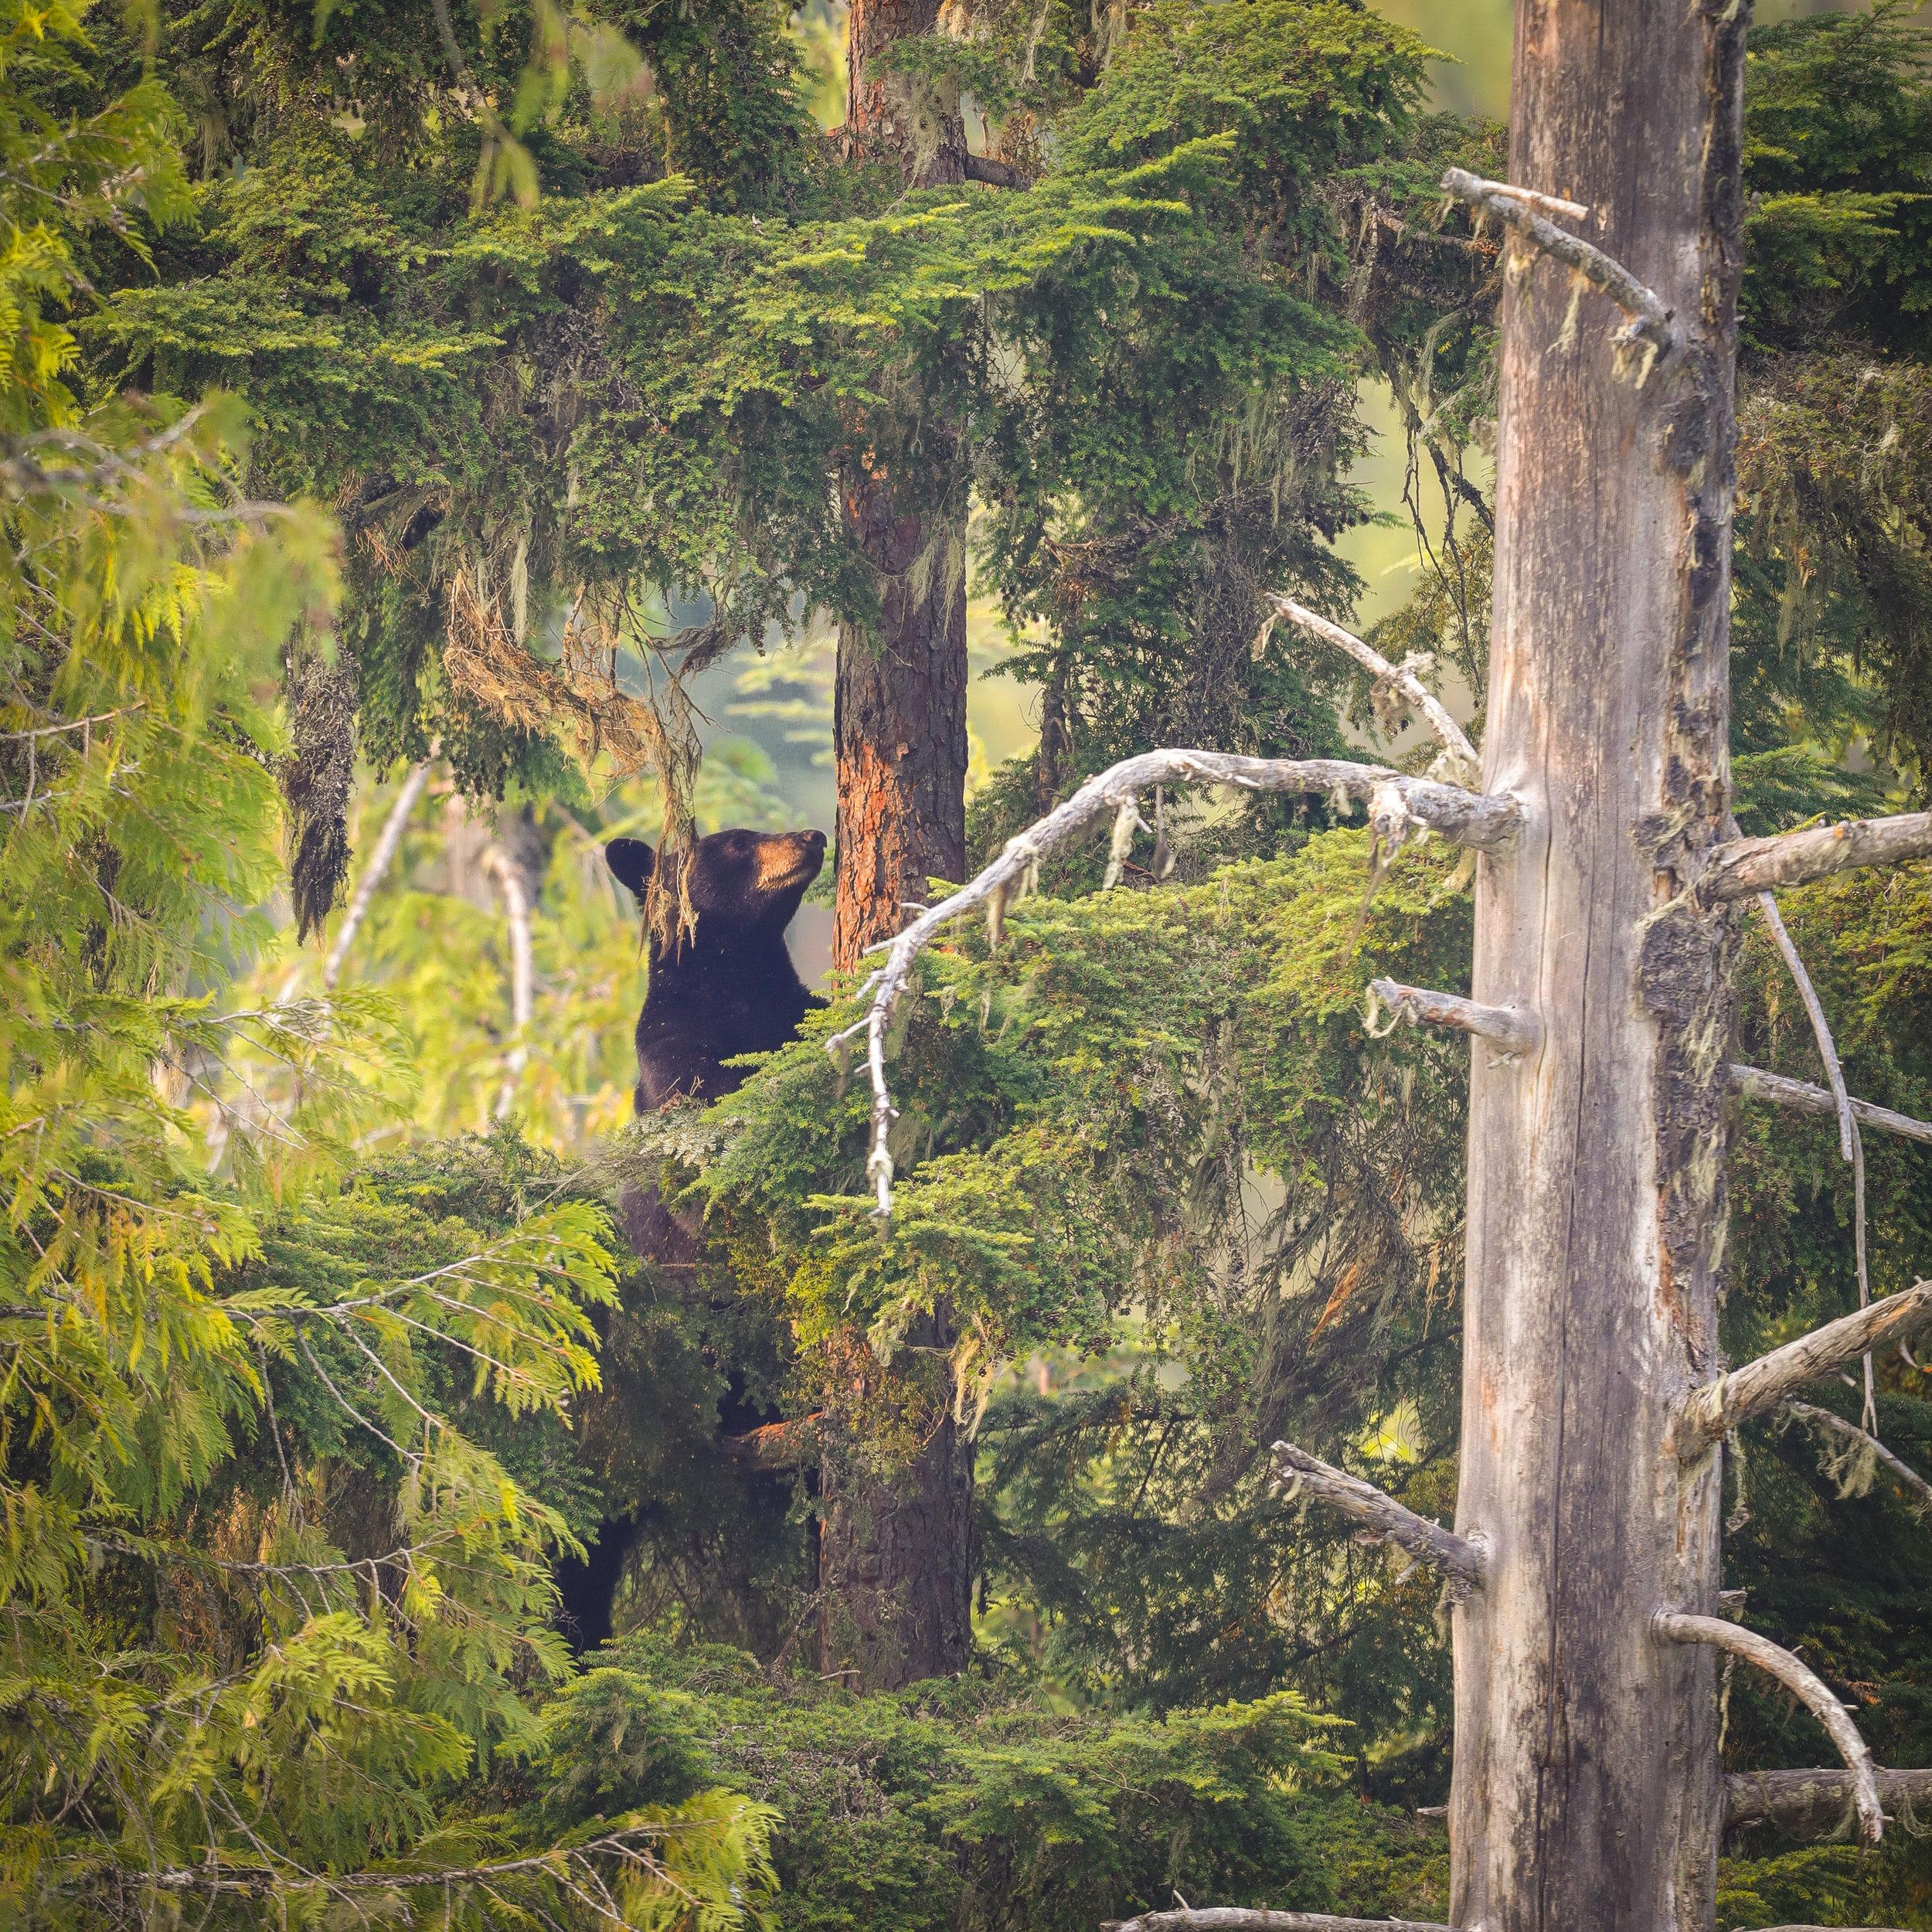 Bear in tree square crop FINAL.JPG